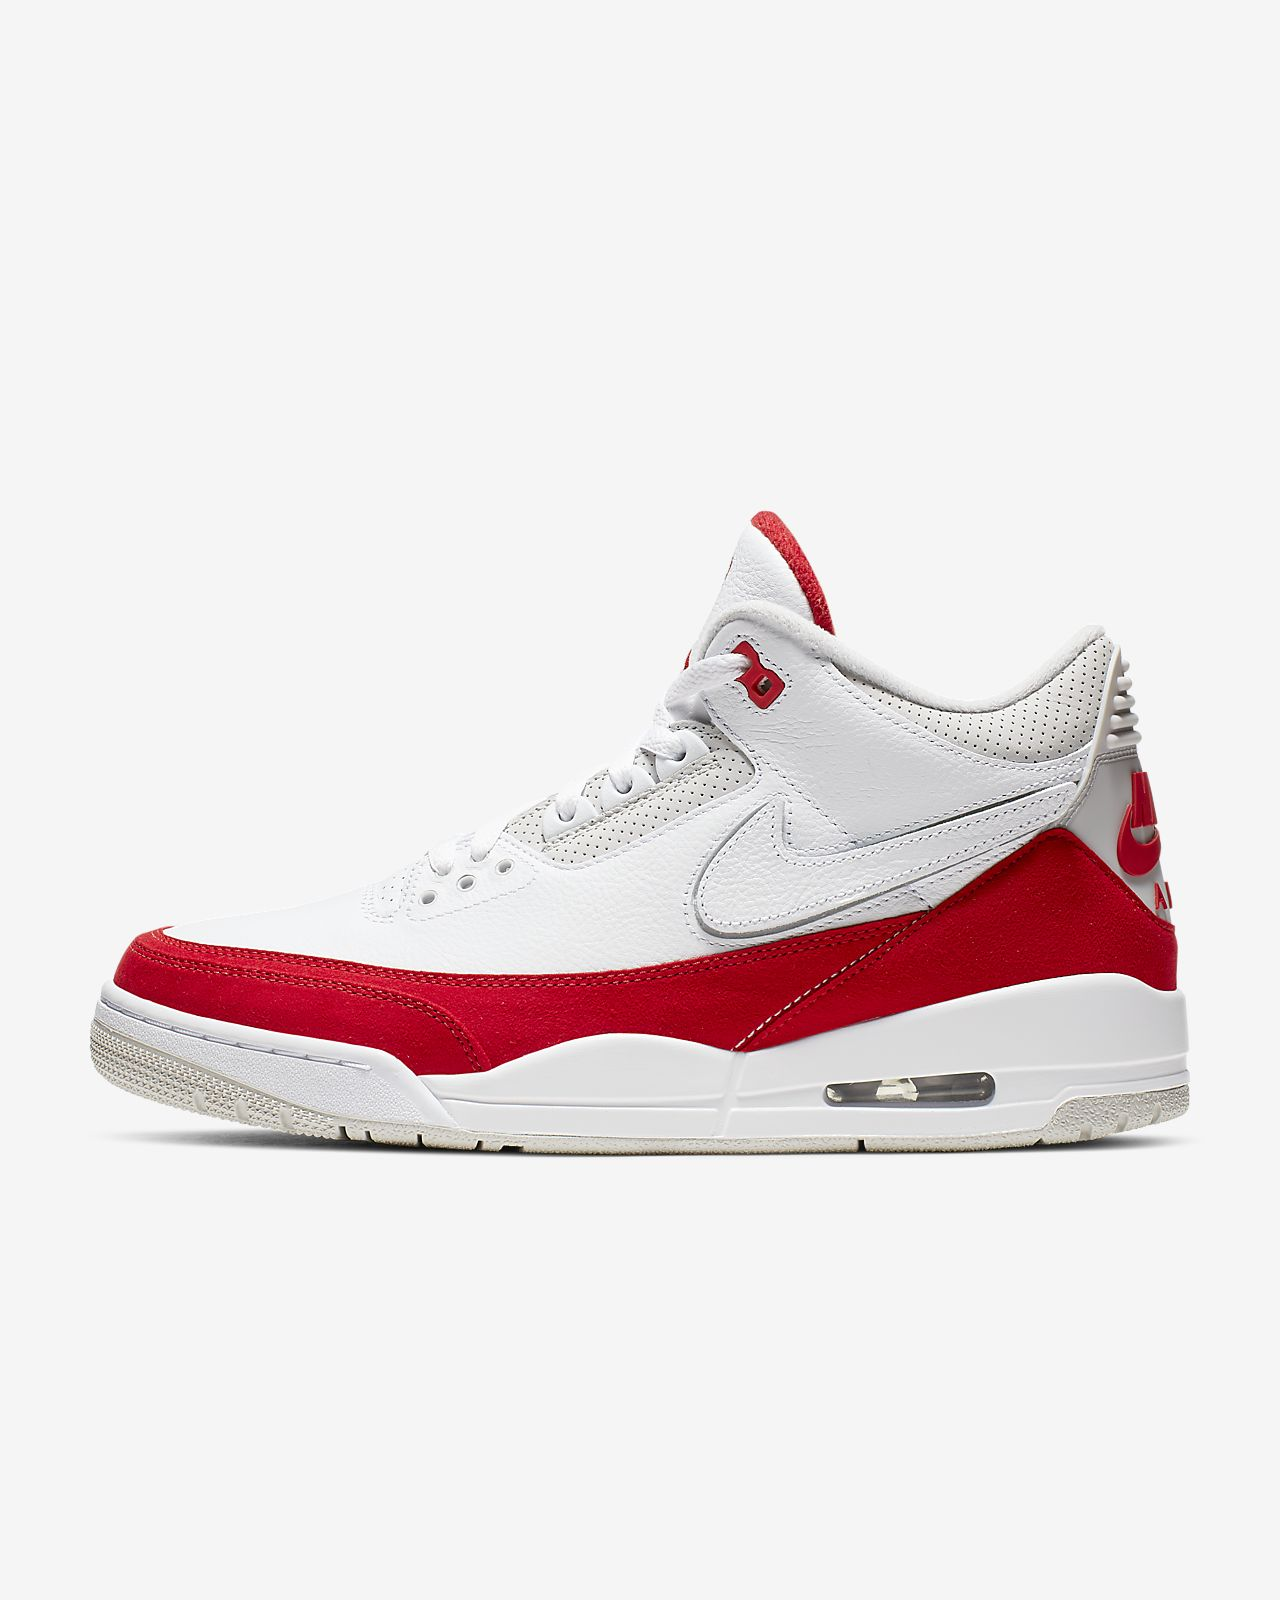 Air Jordan 3 Retro TH SP Men's Shoe